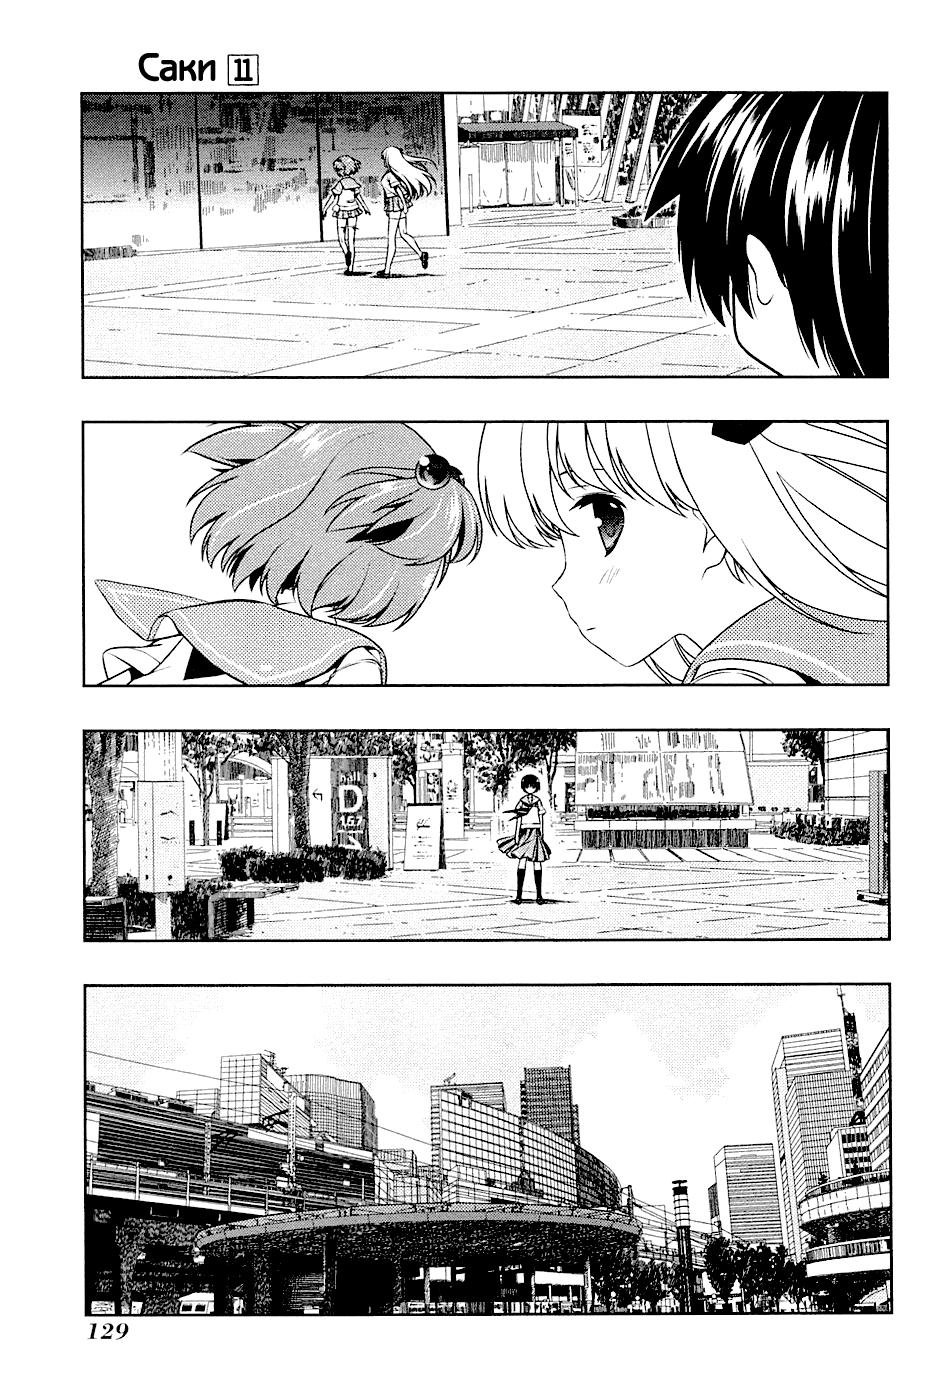 https://r1.ninemanga.com/comics/pic2/33/21665/216087/1428338792482.jpg Page 4